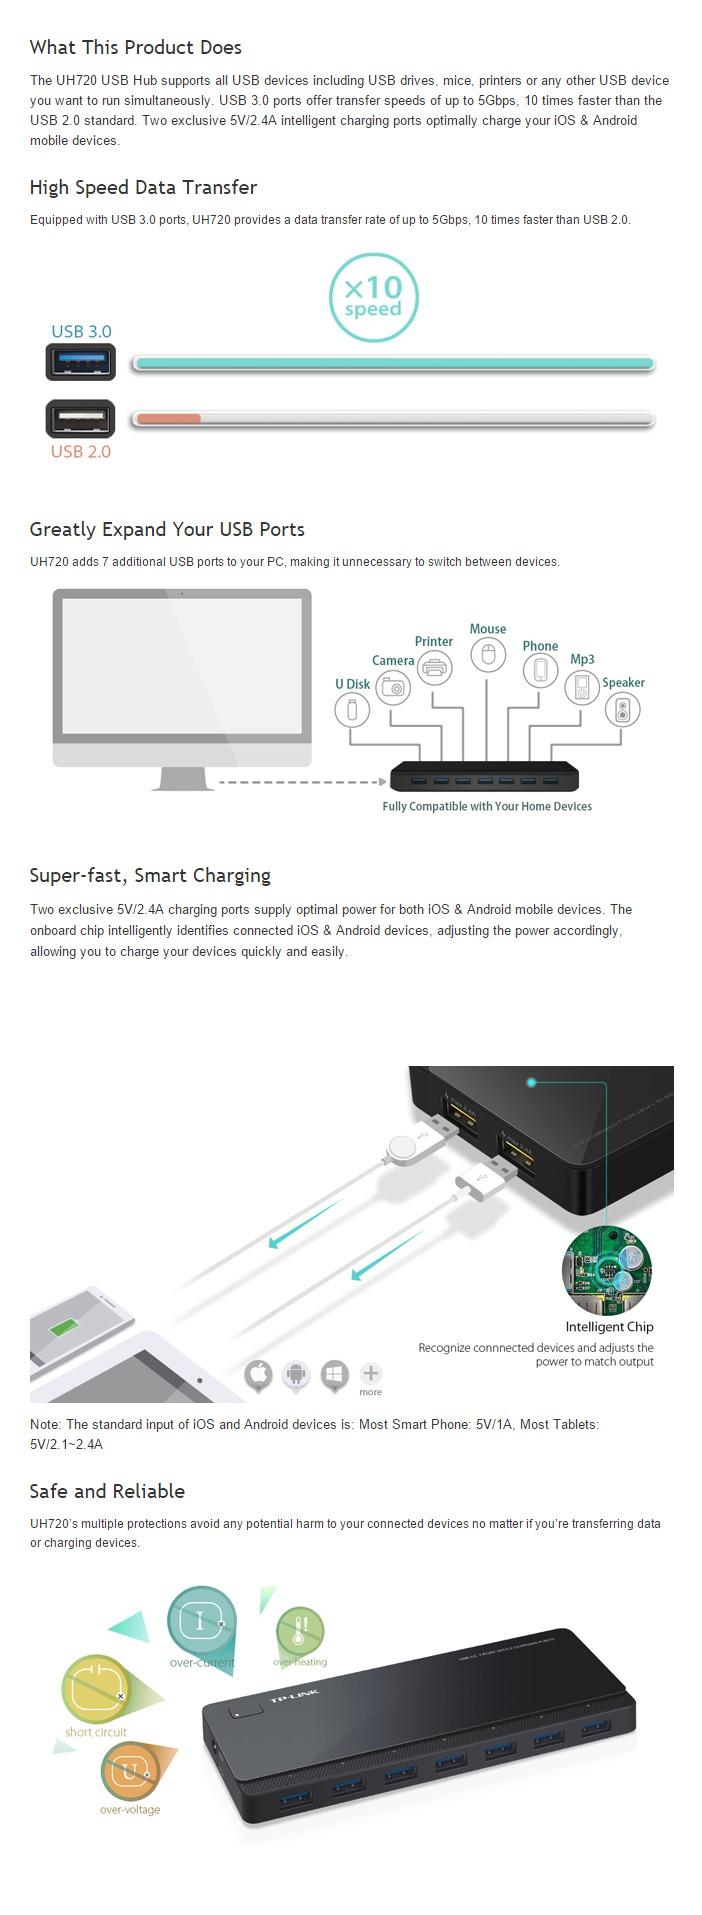 TP-Link USB3 0 7 Port Hub With 2 Charging Ports